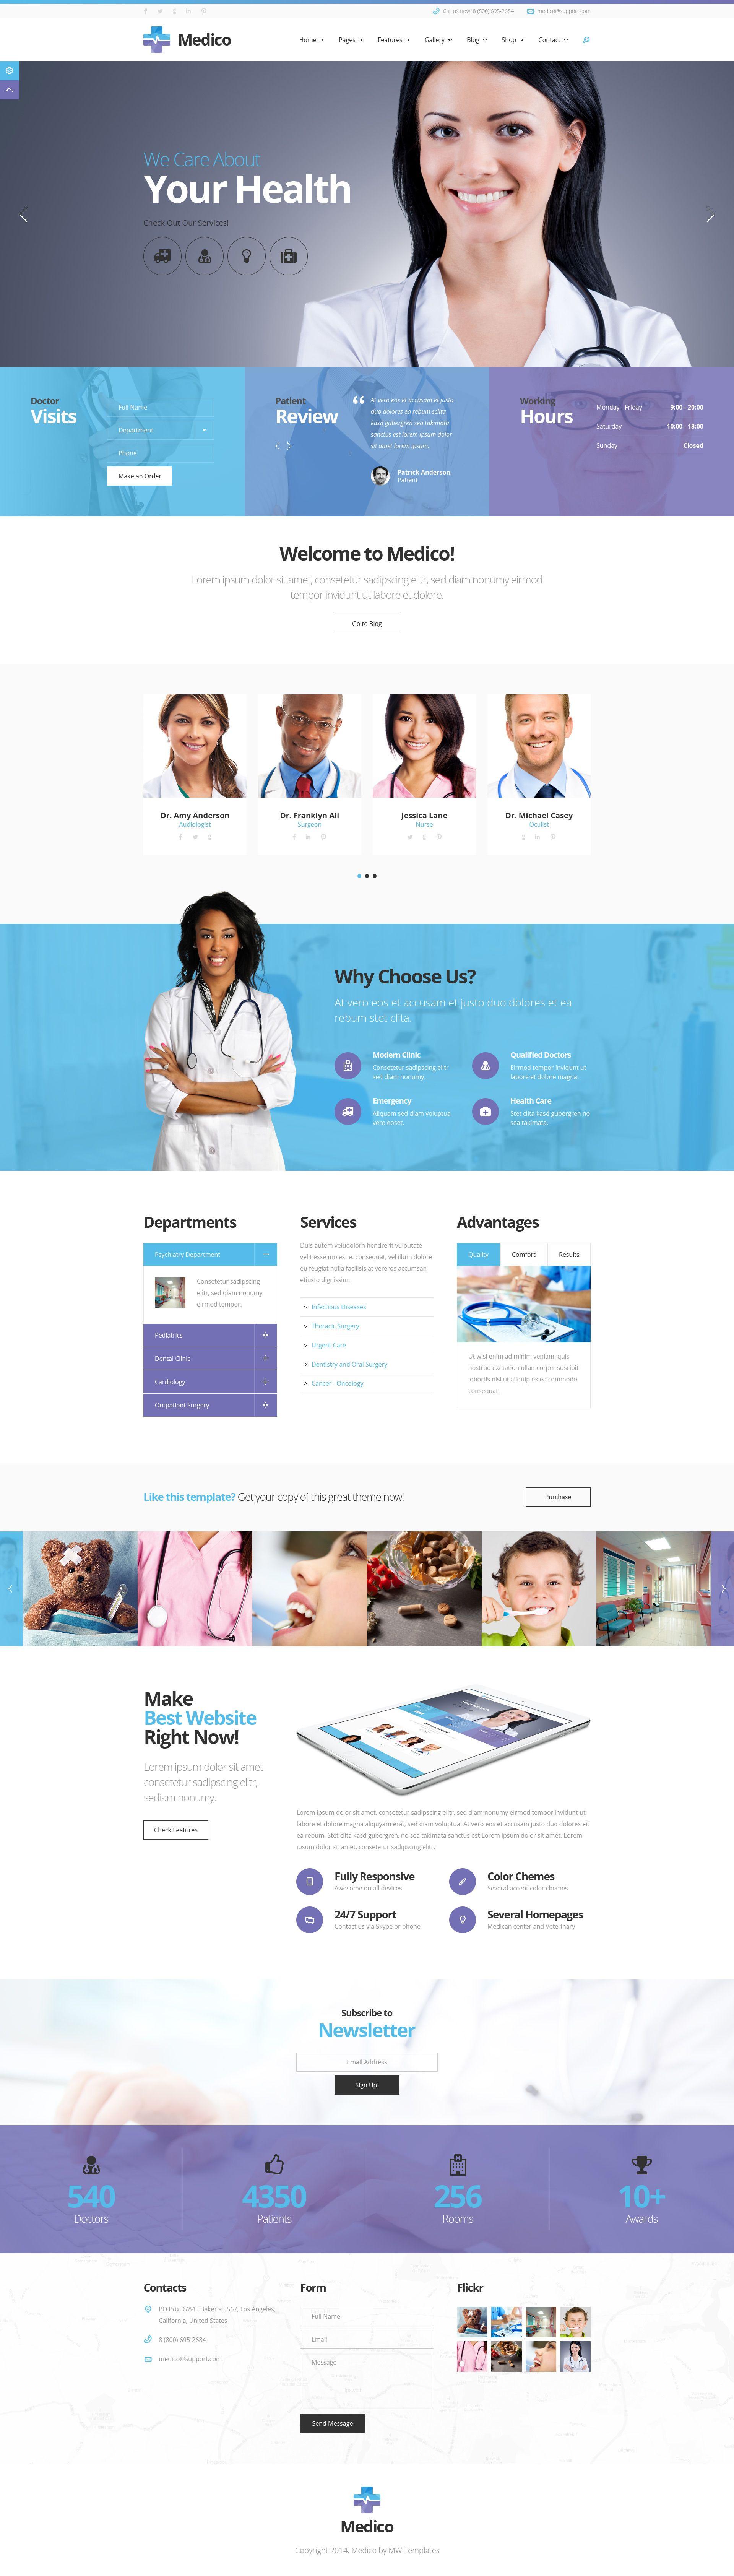 Medico - Medical & Veterinary PSD Template | Psd templates ...